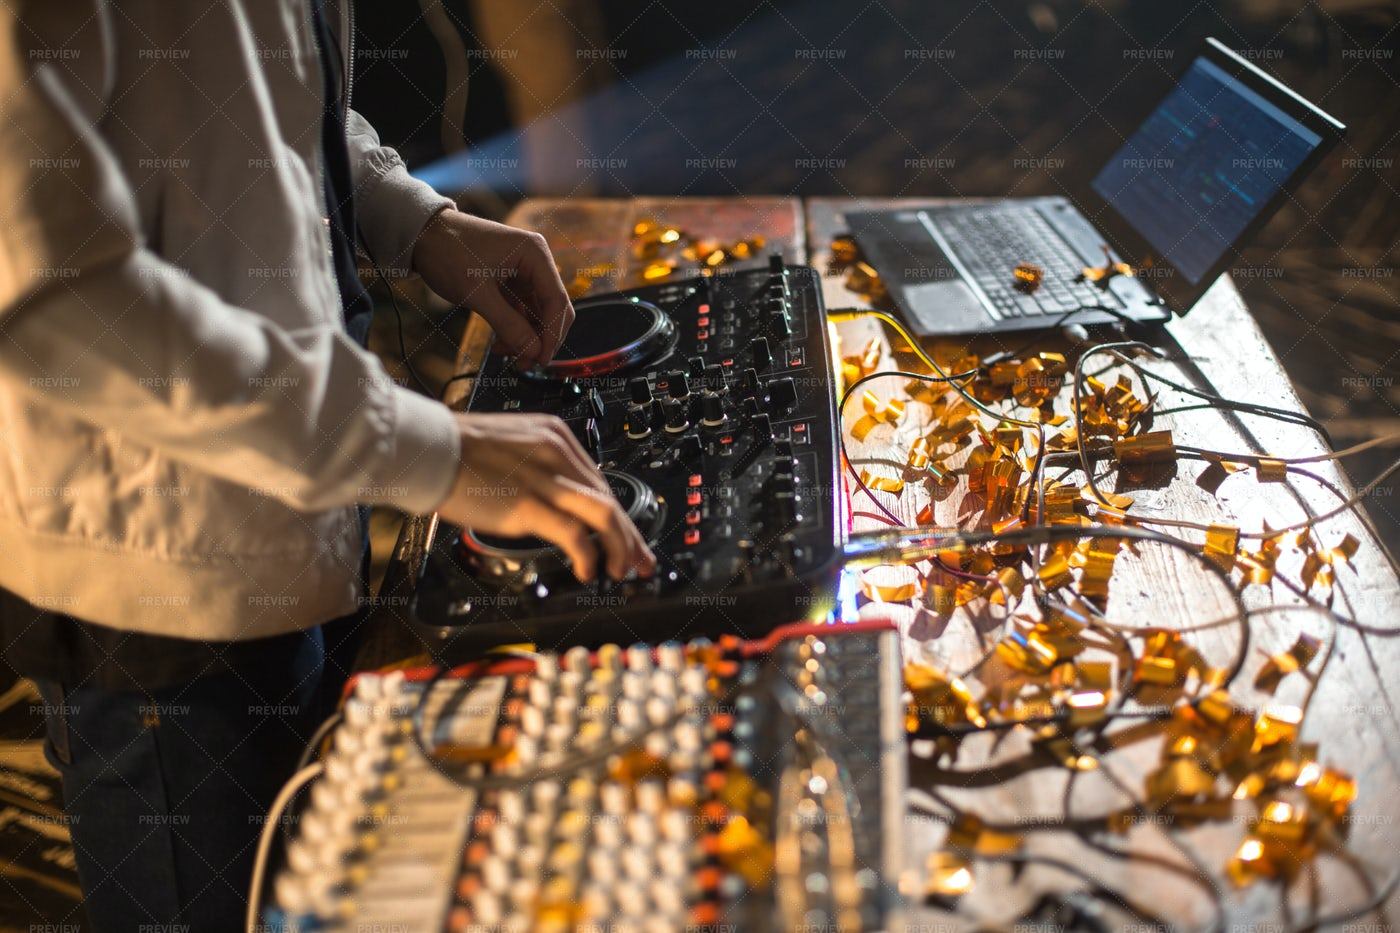 DJ Playing Music In Club: Stock Photos